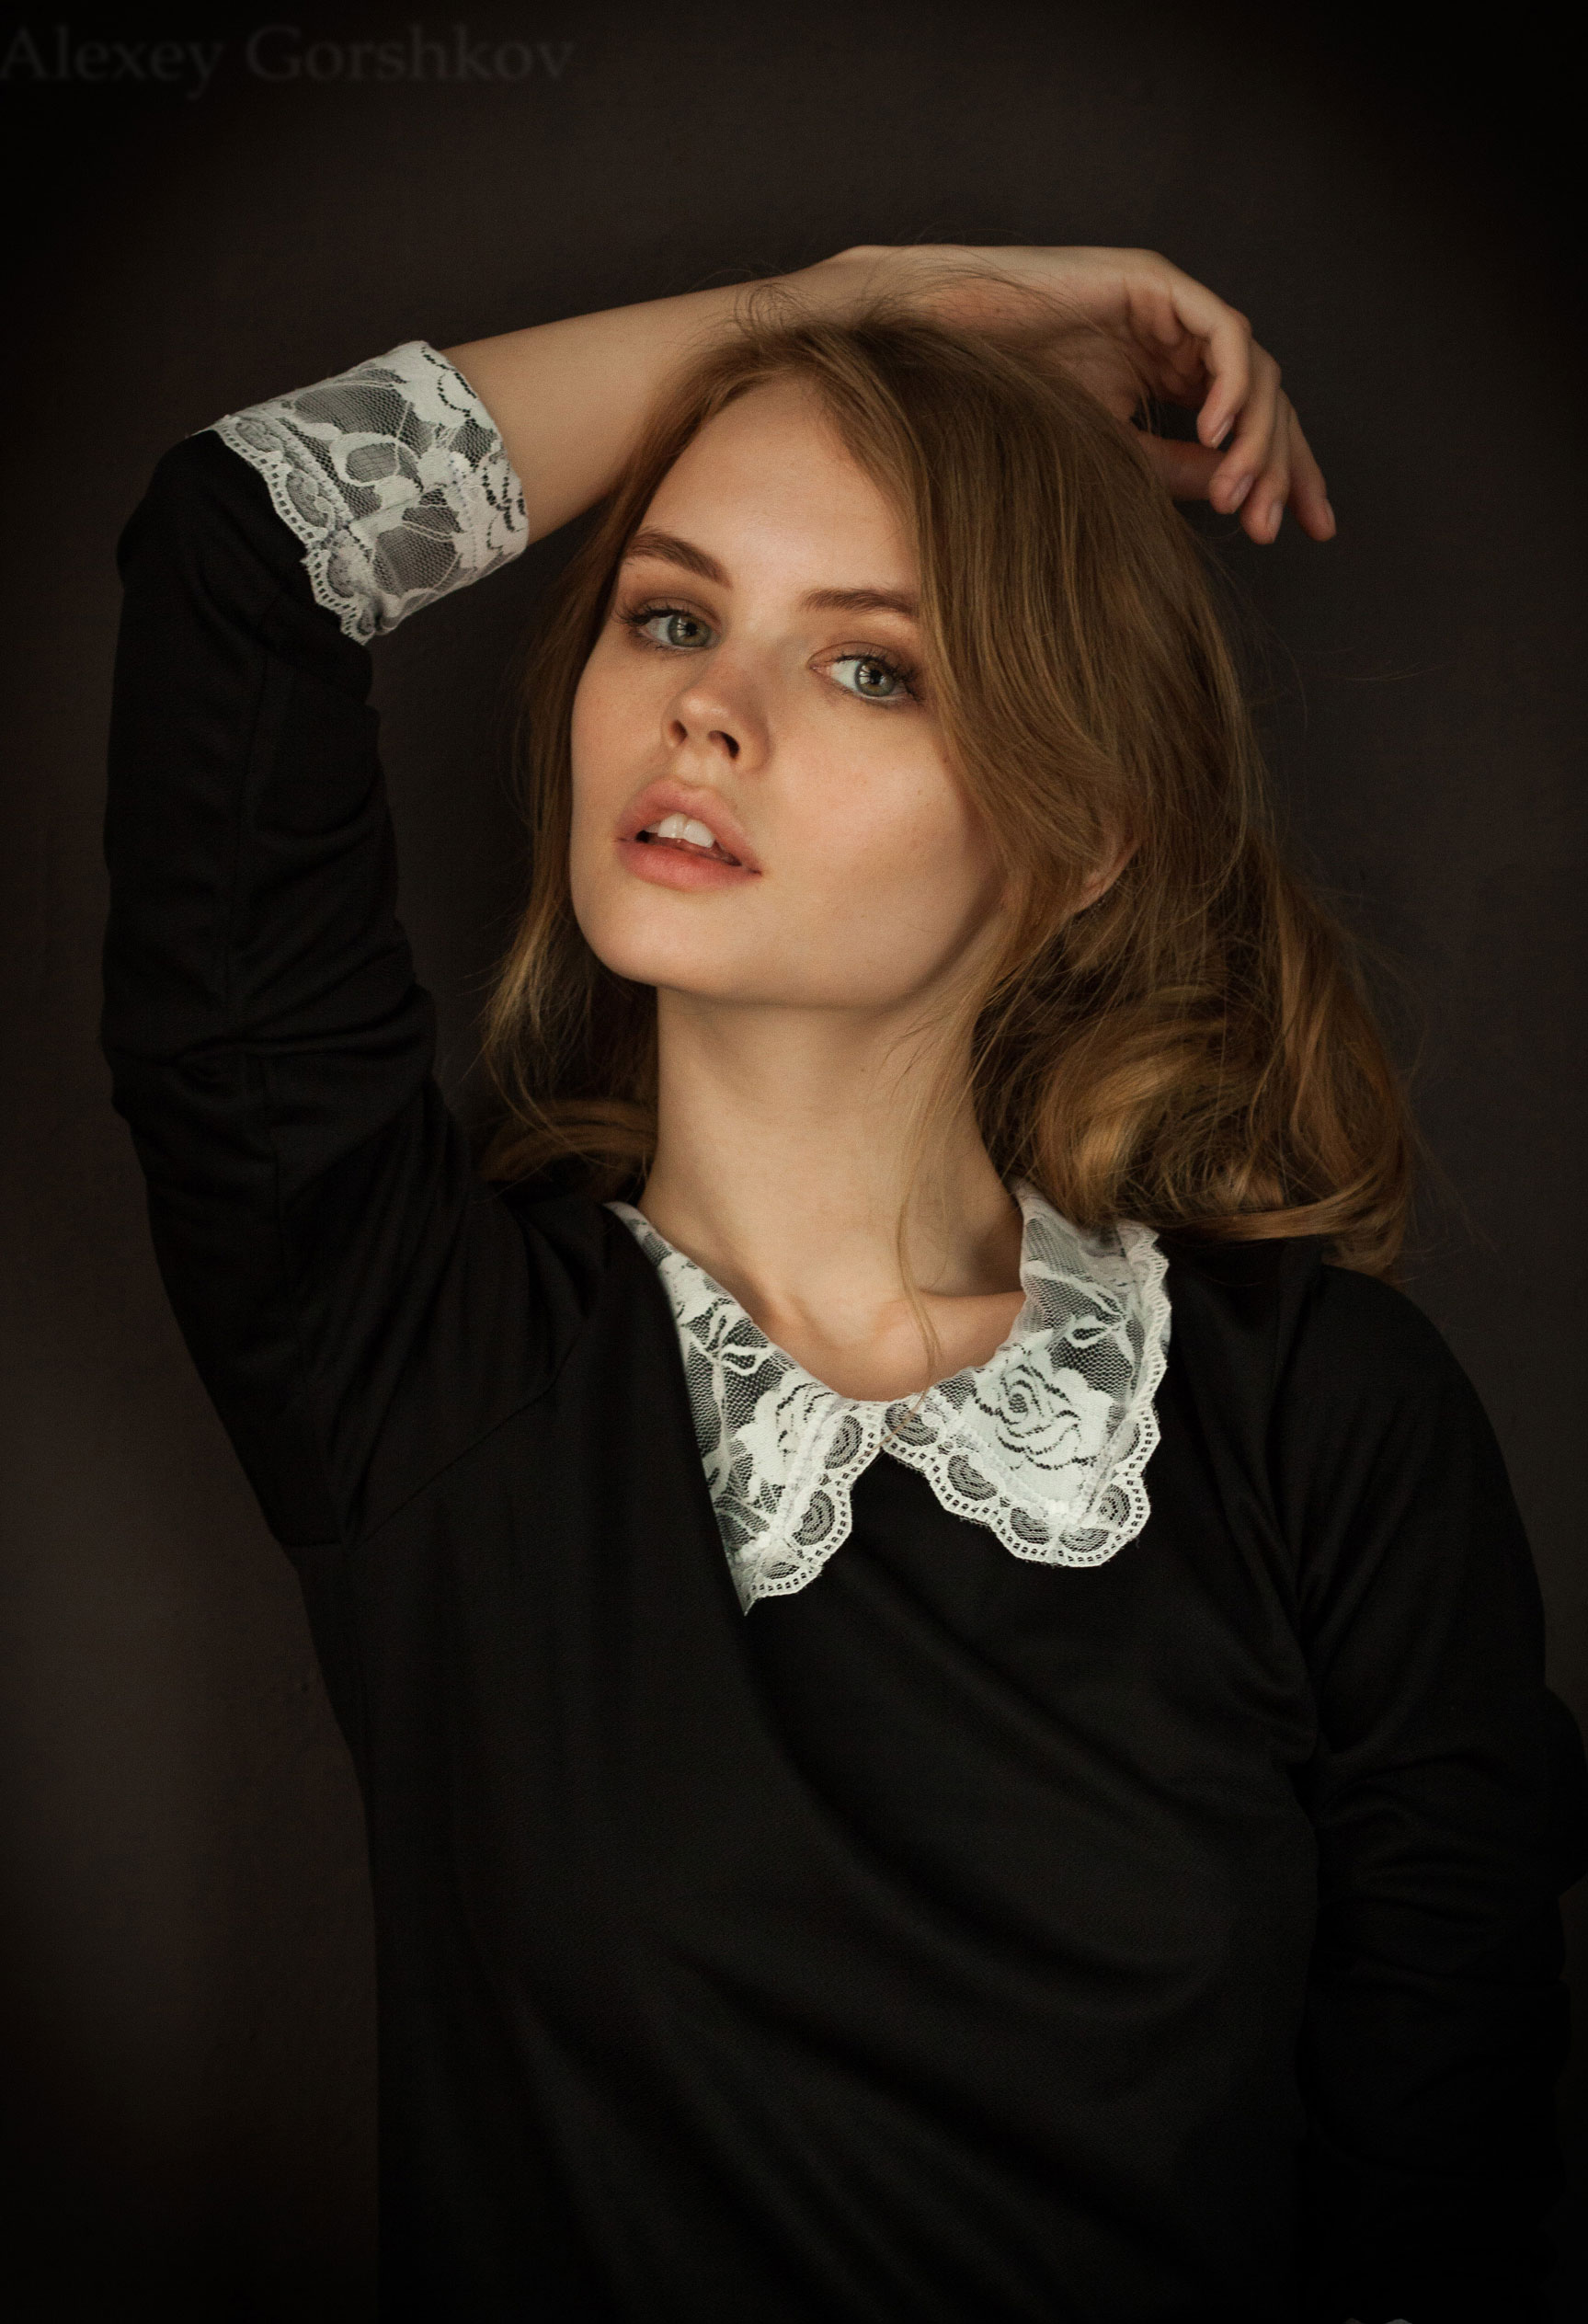 Анастасия Щеглова / Anastasiya Scheglova by Alexey Gorshkov